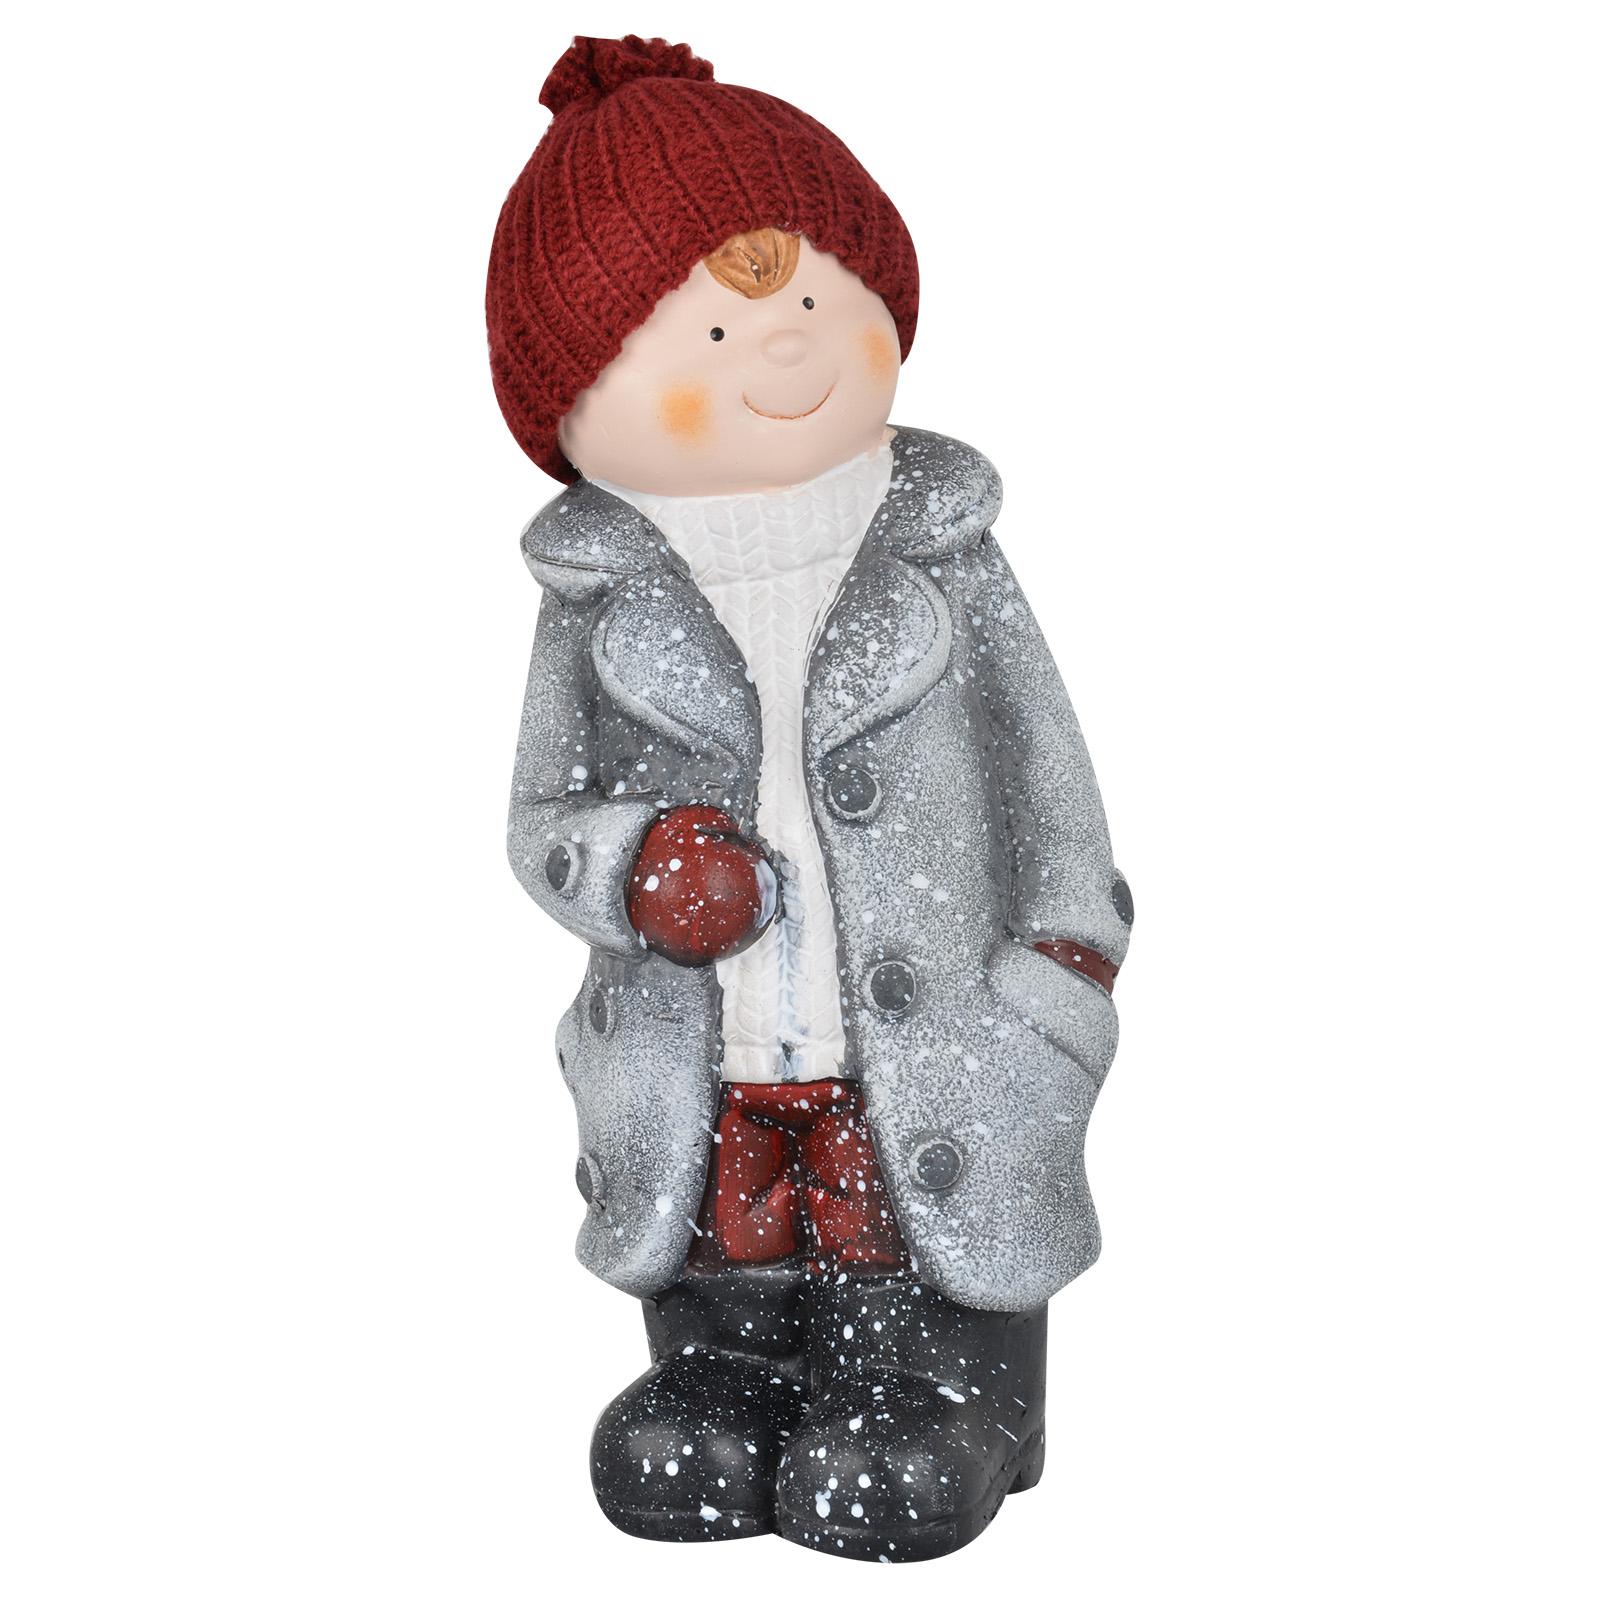 Ceramic Light Up Christmas Tree Uk: Ceramic Christmas Collectible Boy/Girl Figurines Indoor